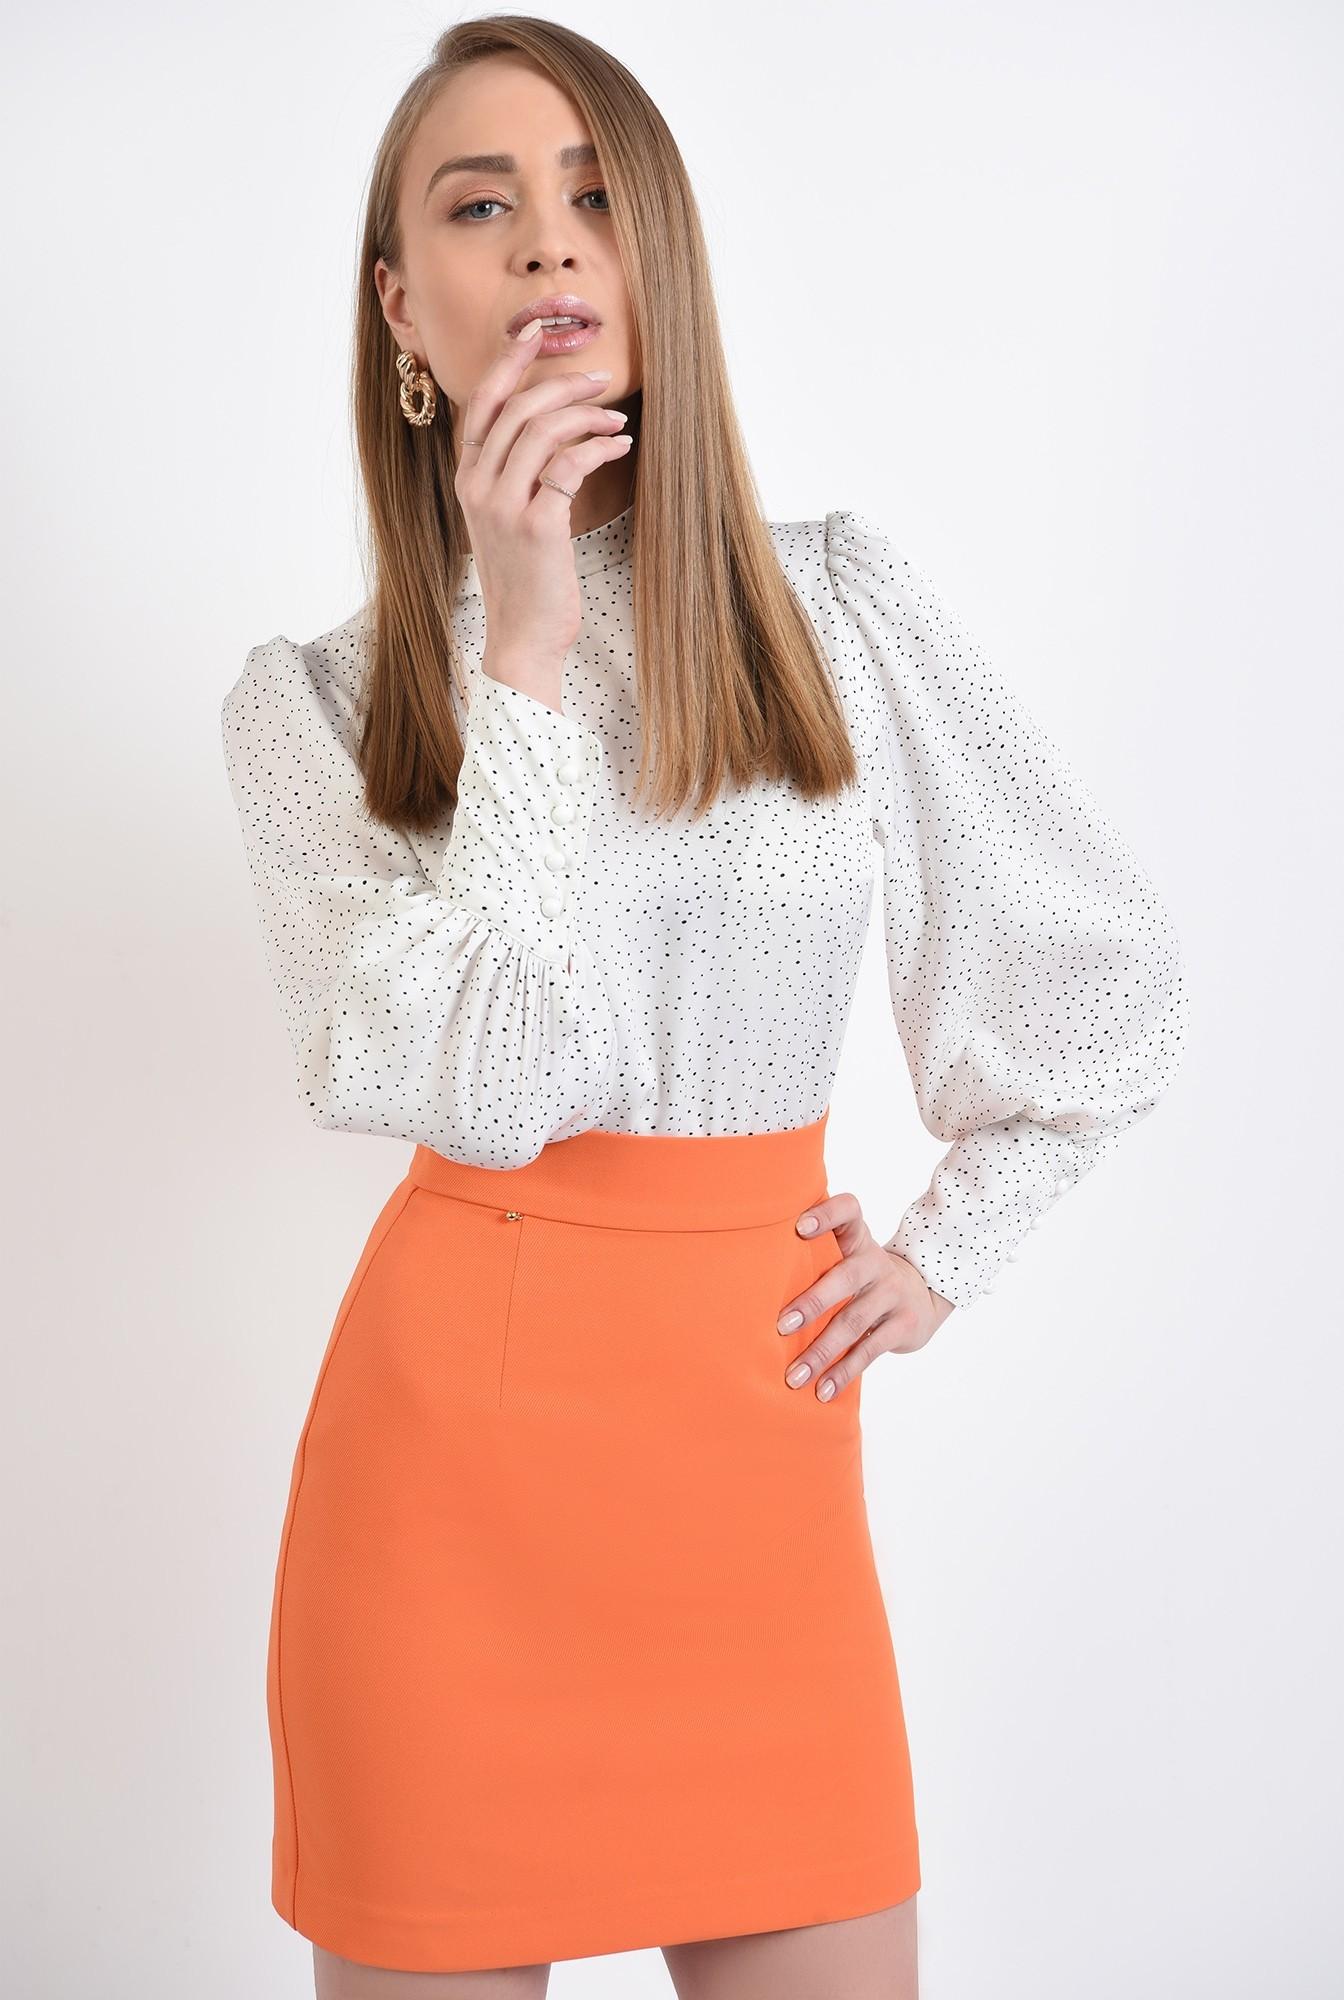 2 -  fusta orange, mini, dreapta, cu talie inalta, fermoar ascuns